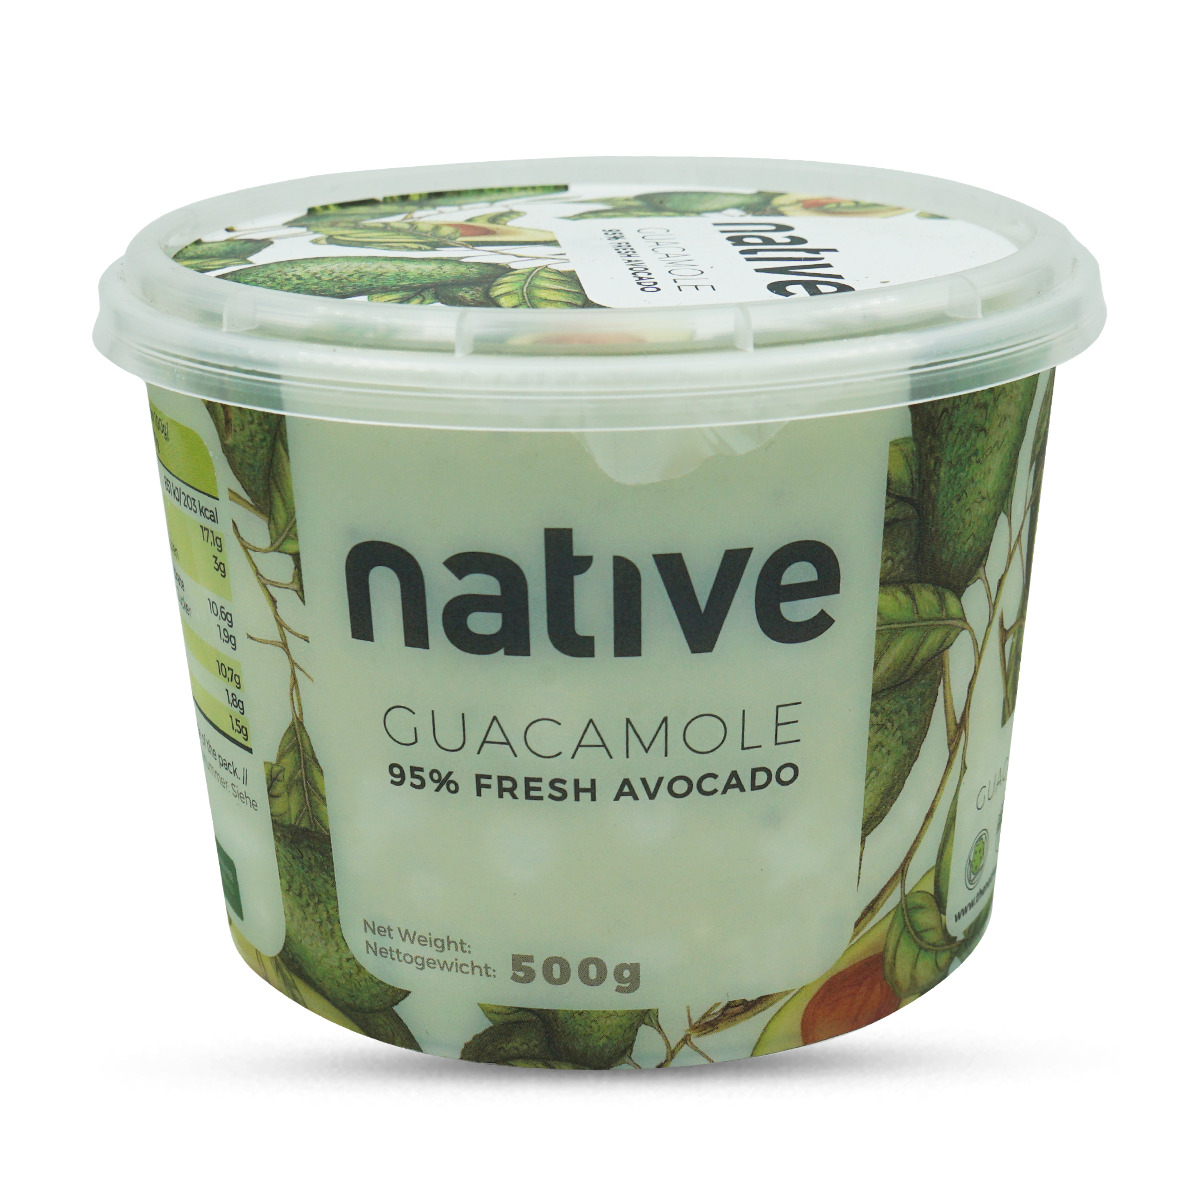 Native Guacamole